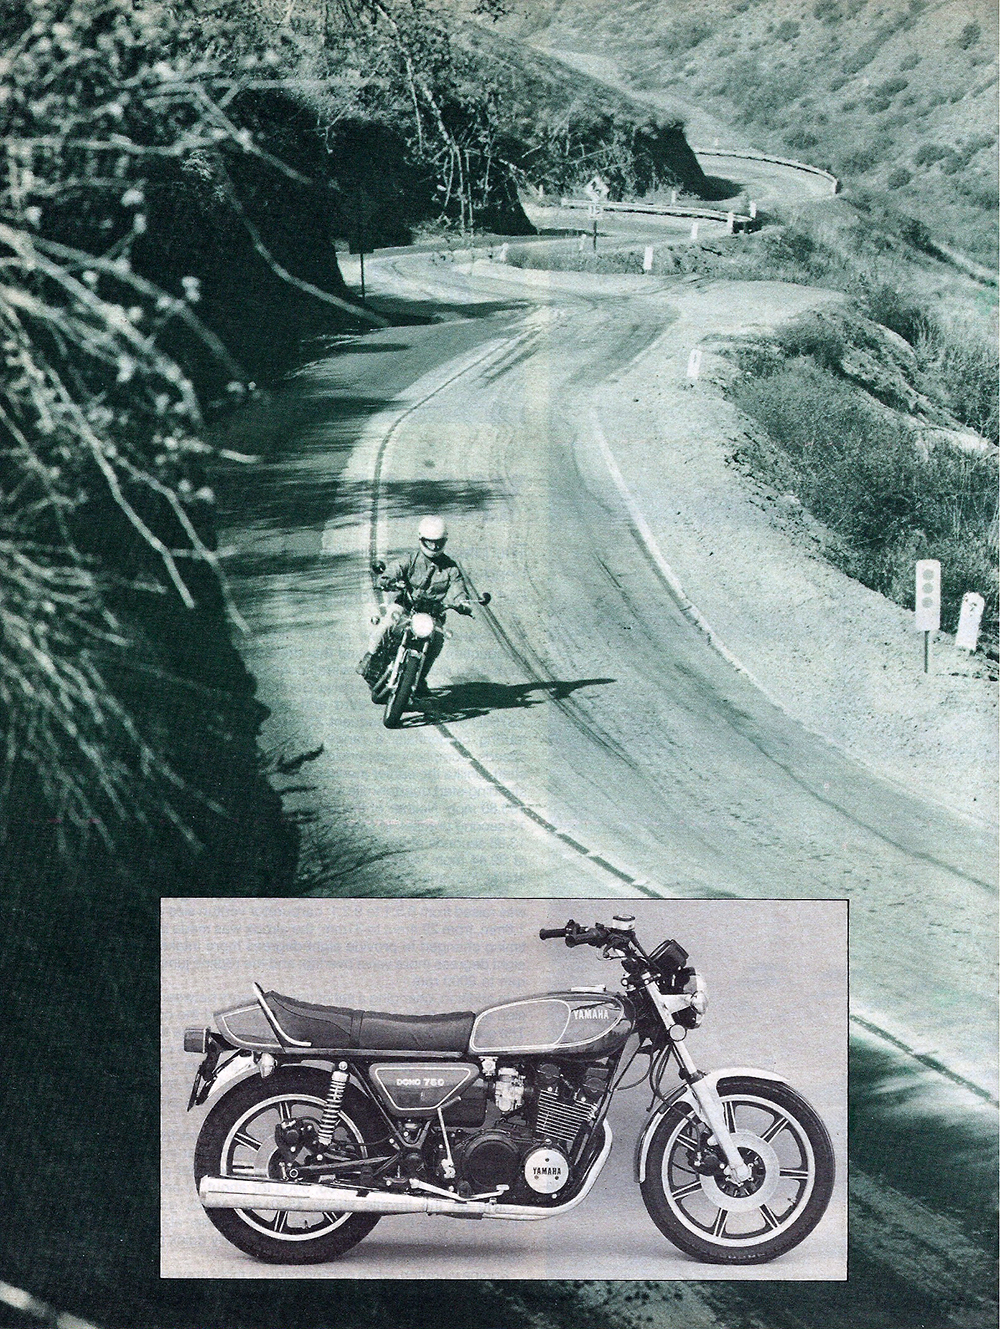 1978 Yamaha XS750E road test 3.jpg